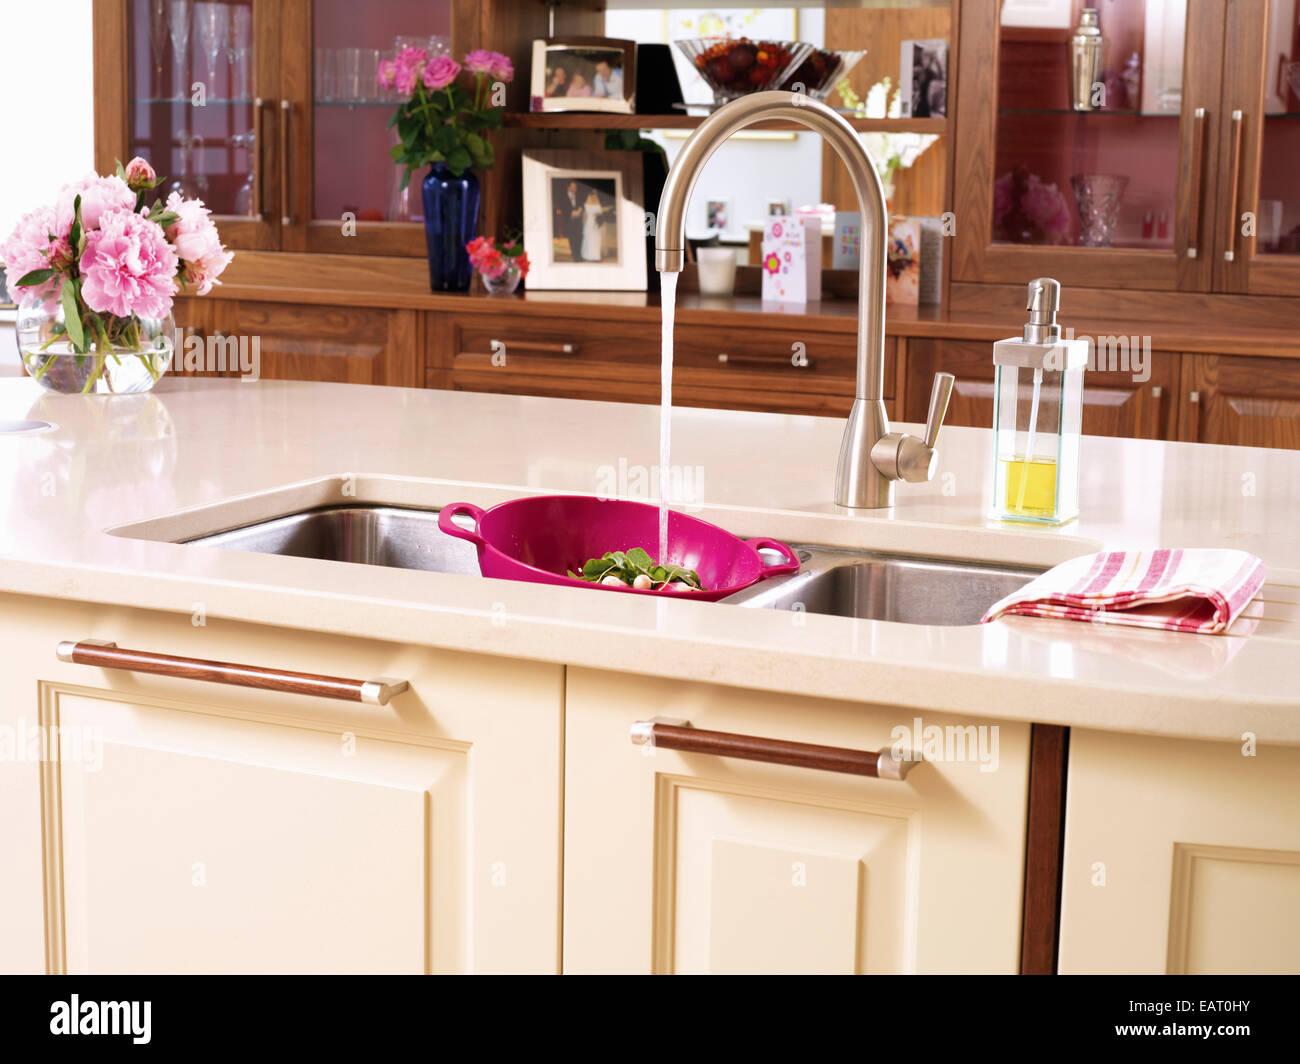 Sink Unit Stockfotos & Sink Unit Bilder - Alamy